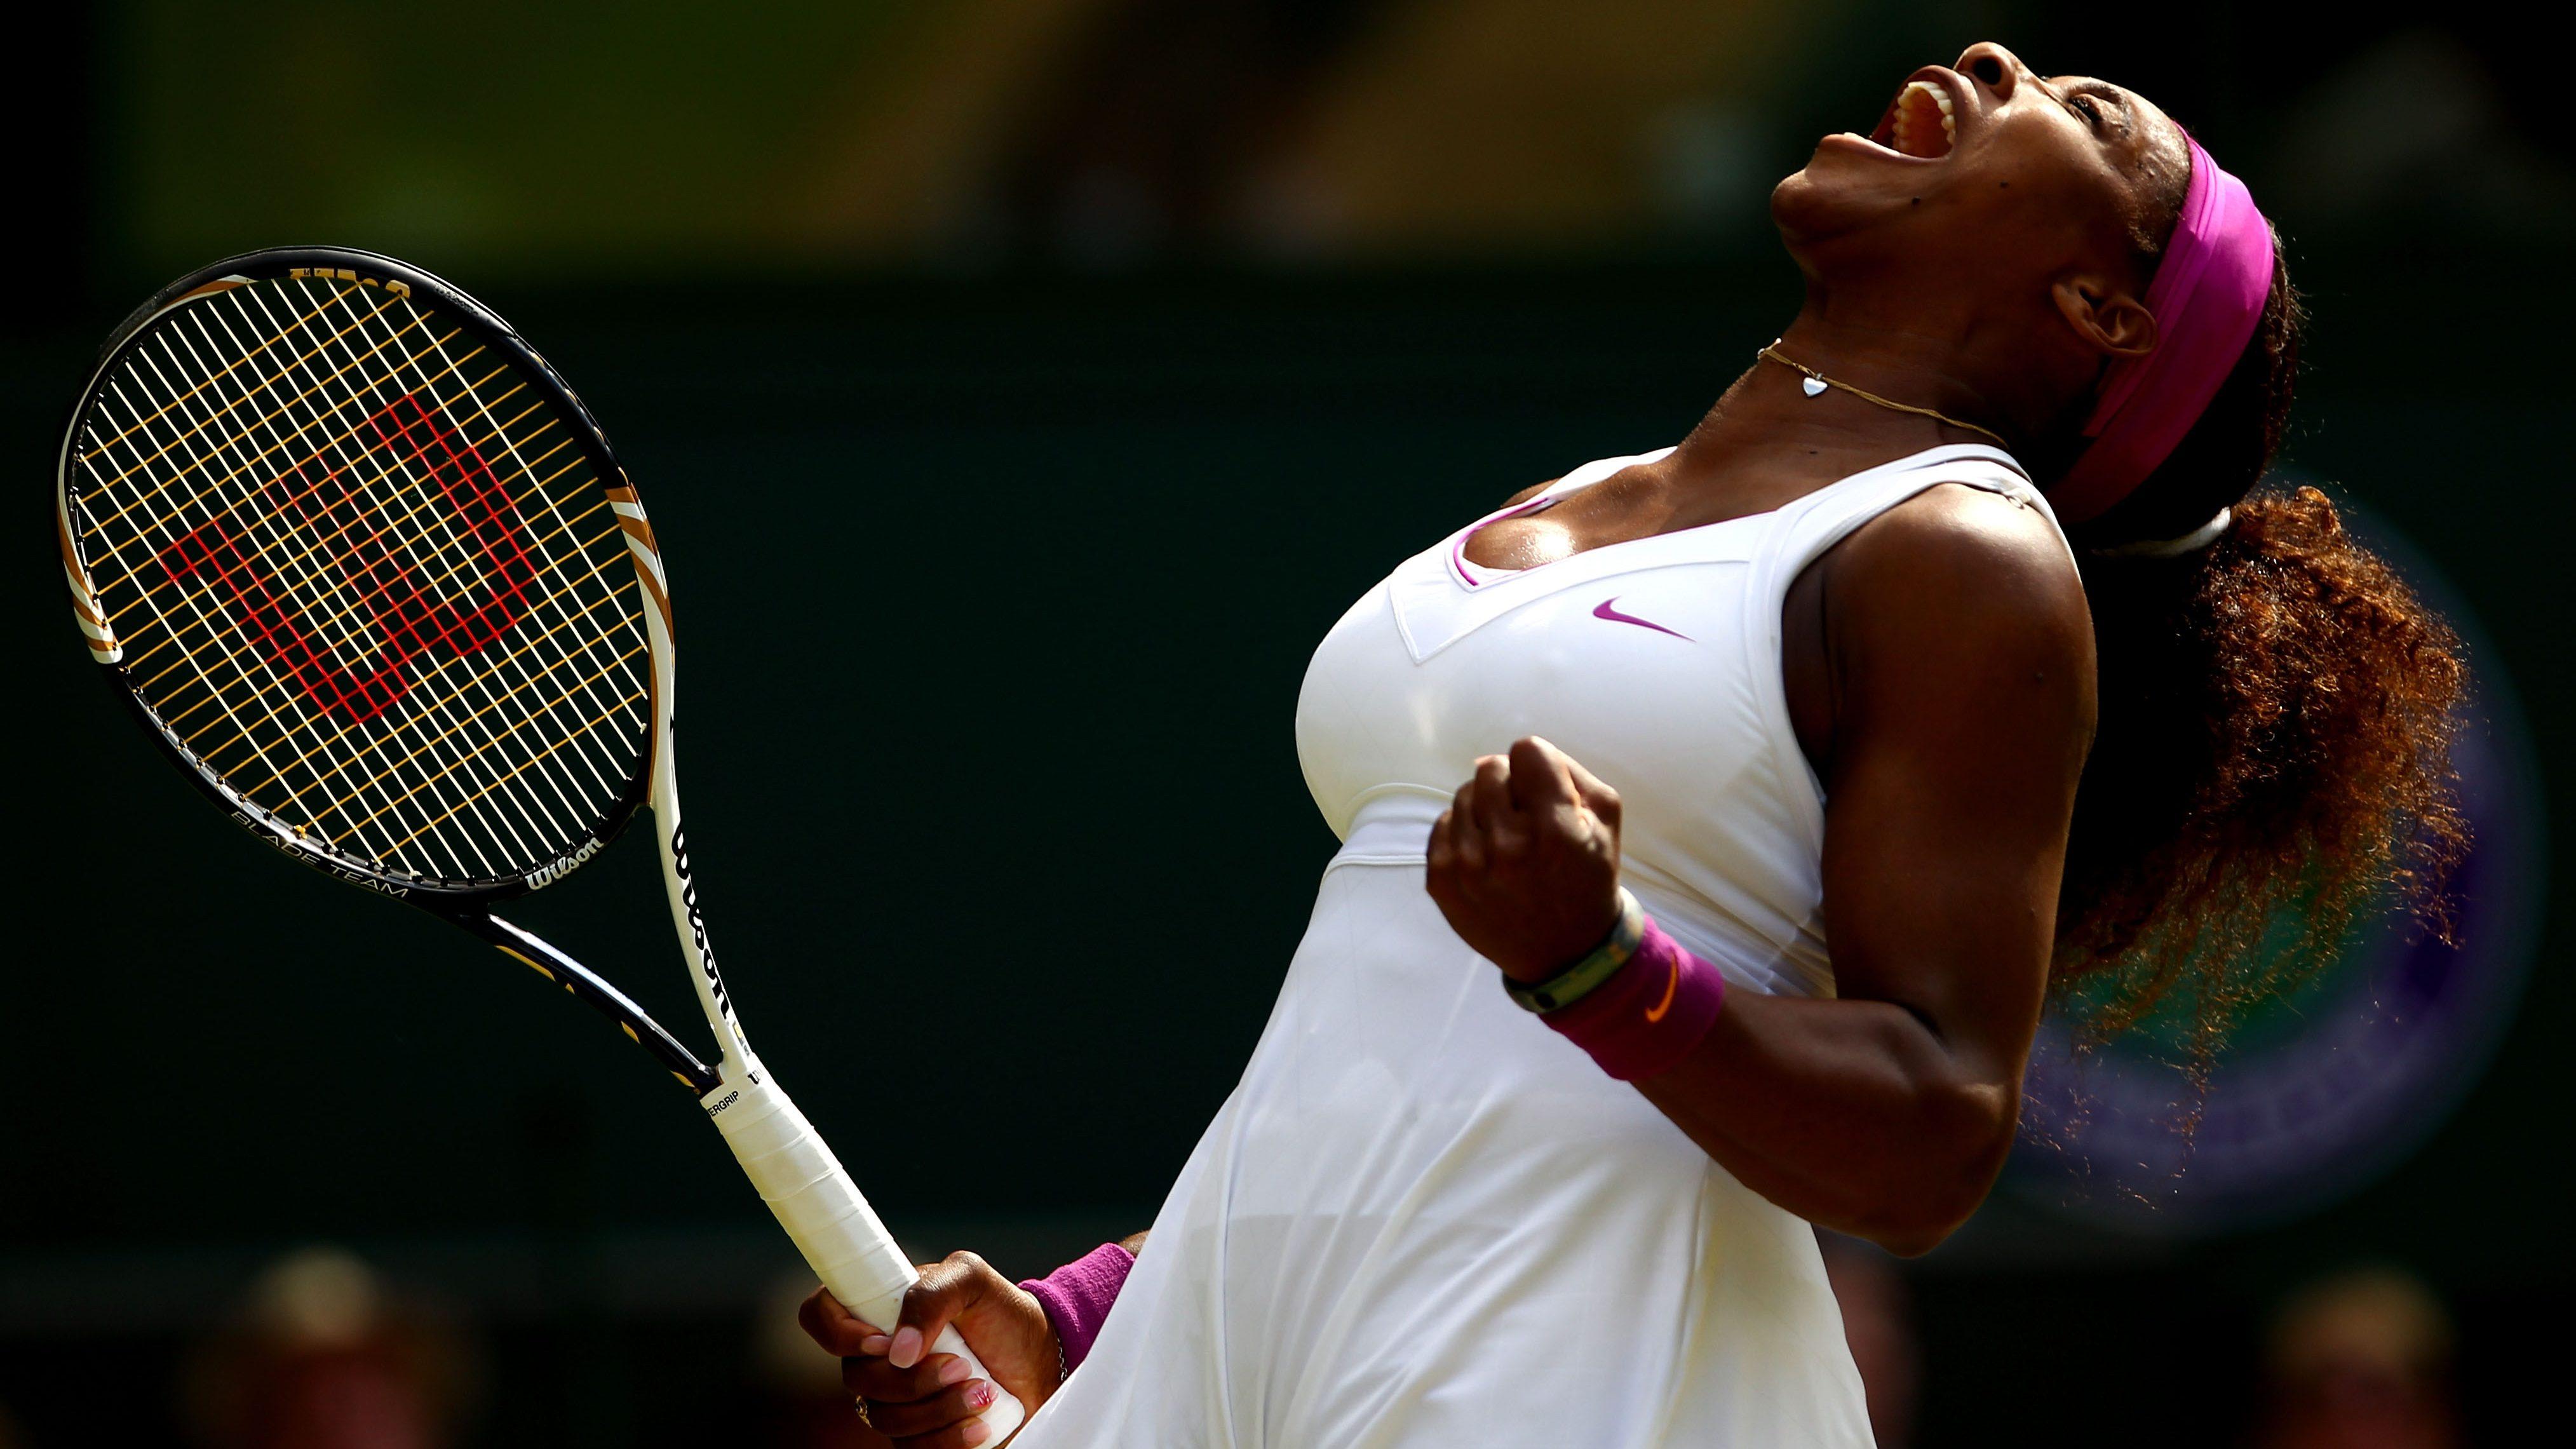 It's Serena Day